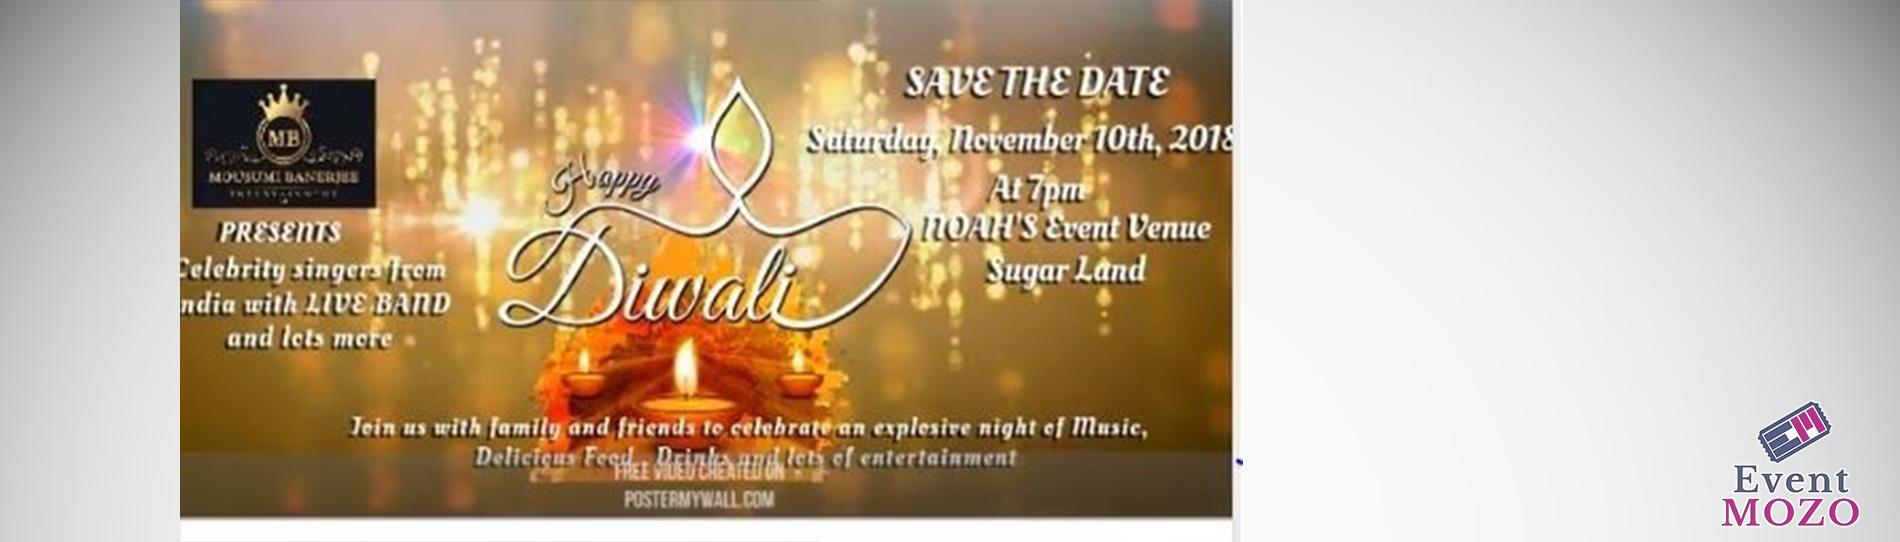 EventMozo Diwali Nite 2018 in Houston